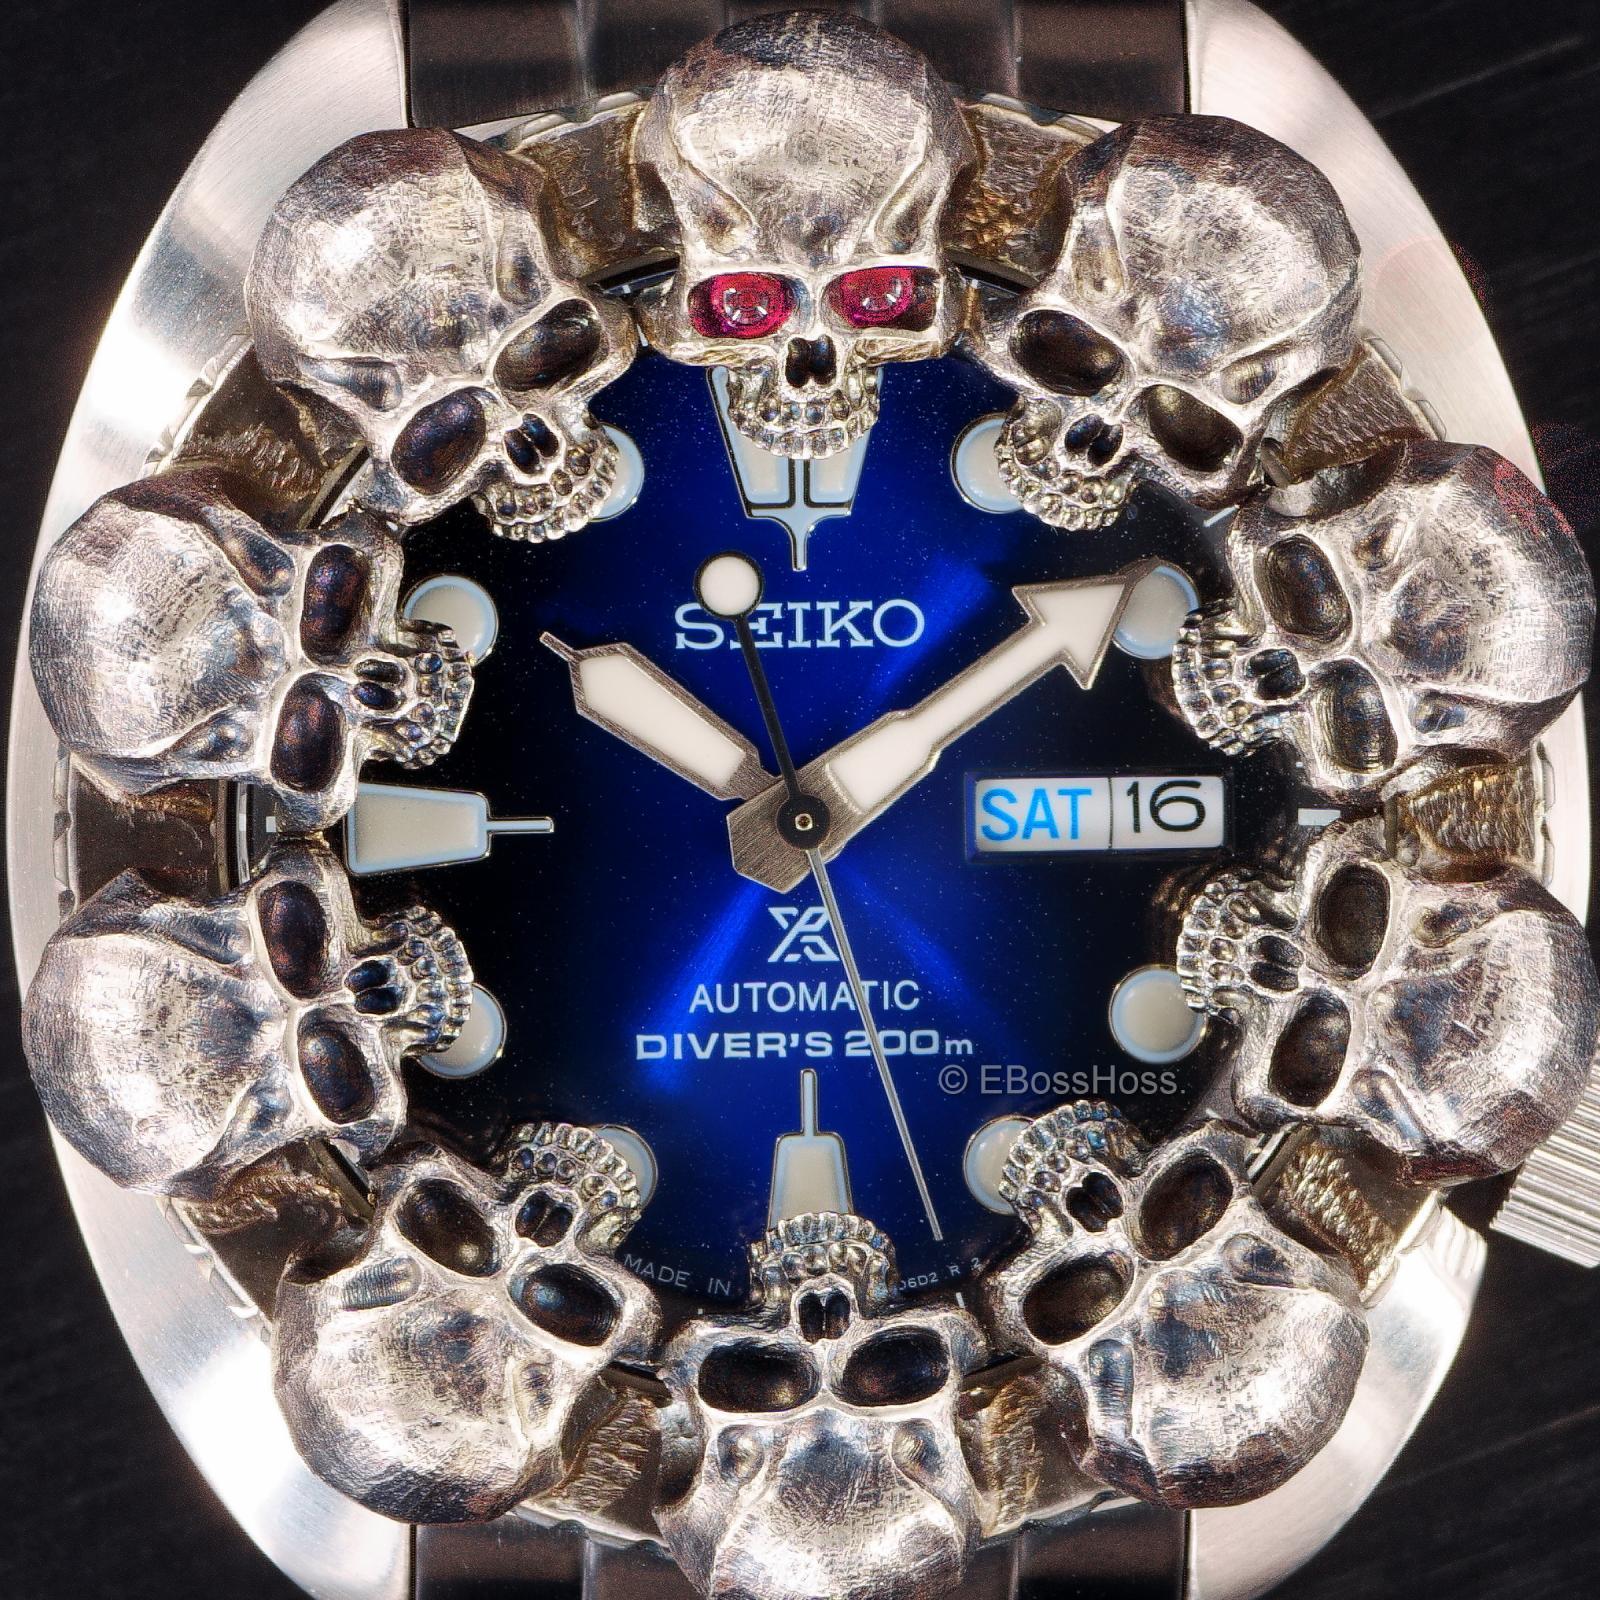 Steel Flame Custom Skulls Vigilant ONE Seiko Prospex Automatic Divers 200m 4R36-04Y0 - by Derrick Obatake